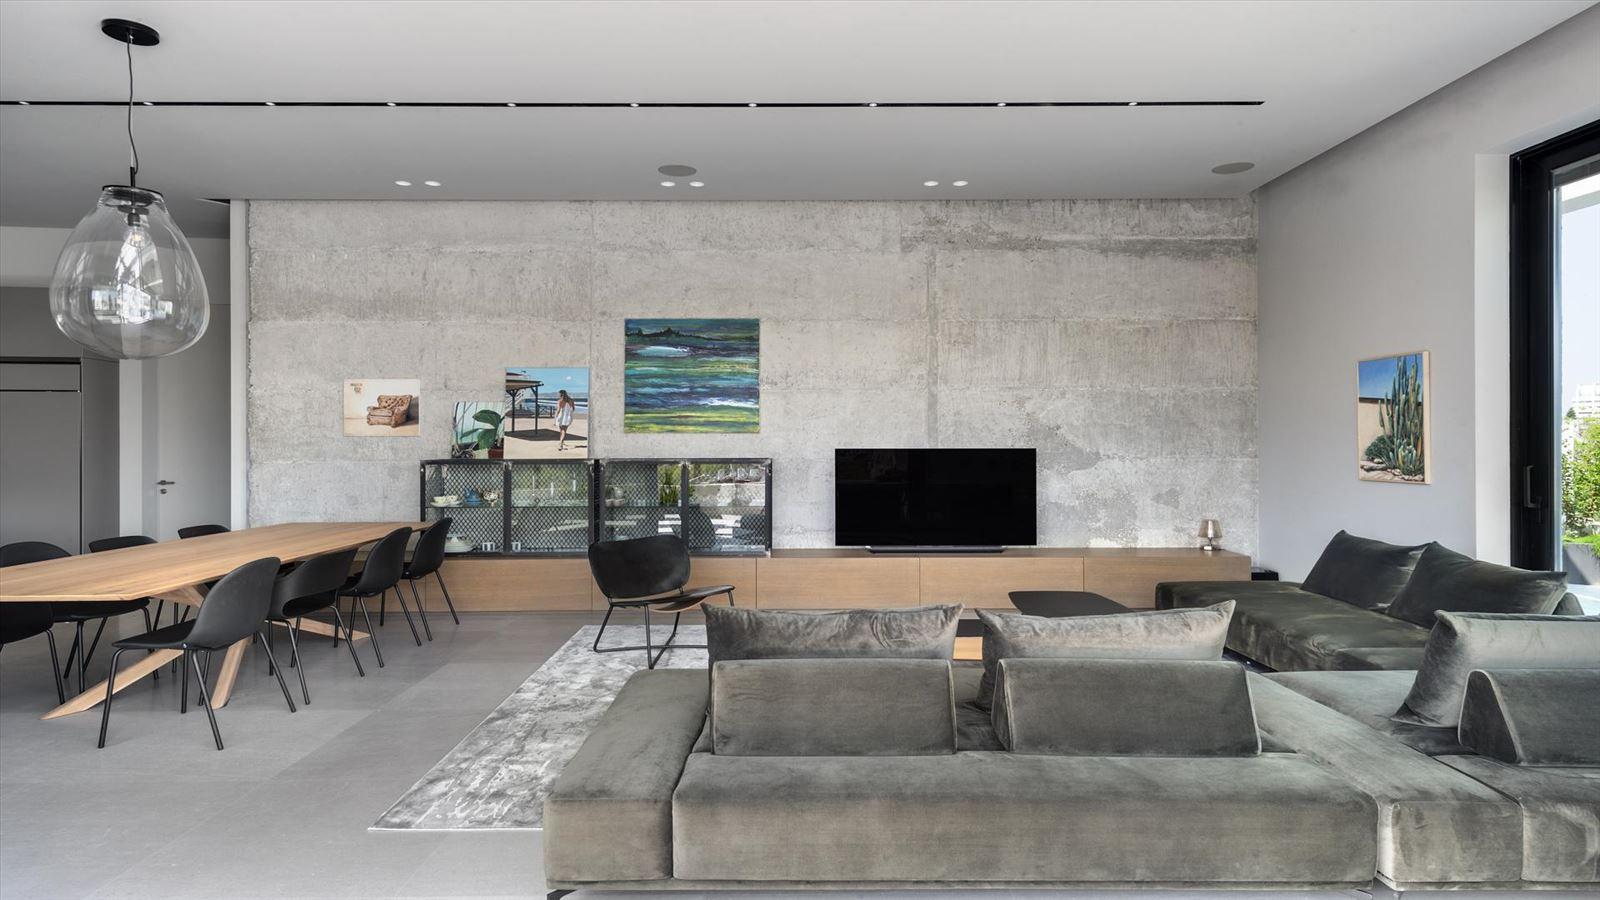 CENTRAL TLV LOFT תכנון פינת הסלון בגופי תאורה מיוחדים על ידי קמחי תאורה